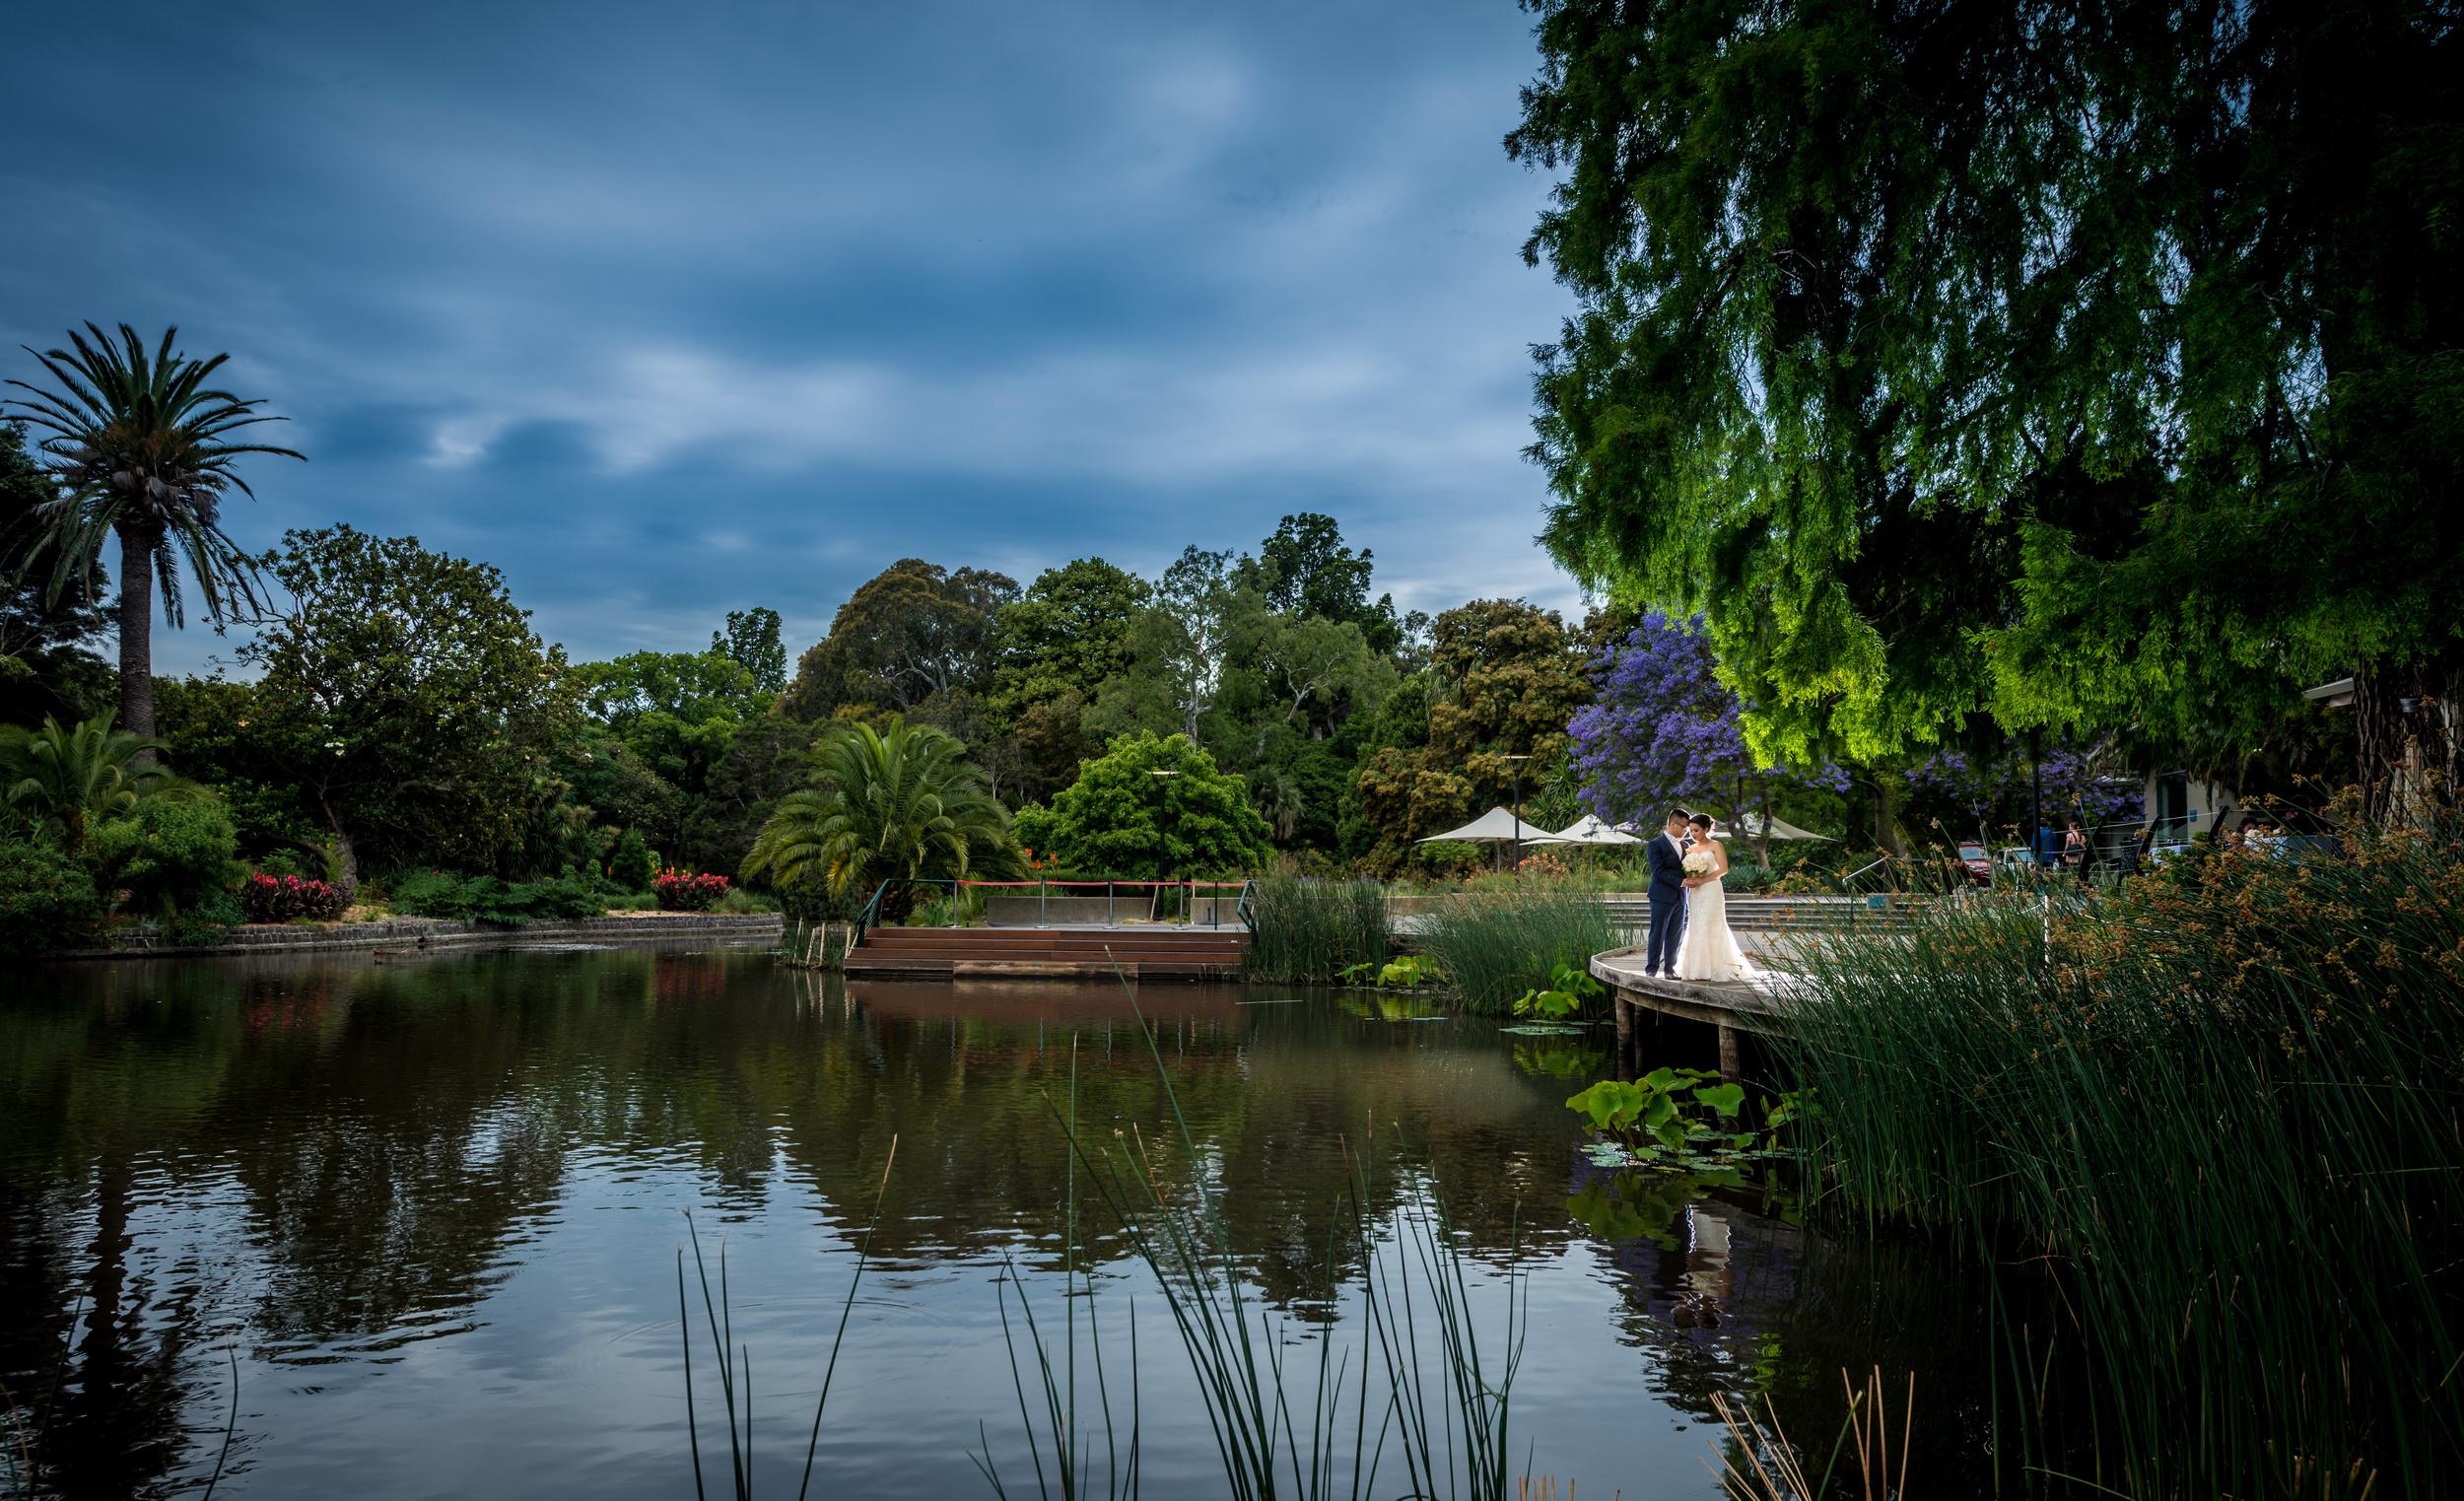 Dominique & Mark - The Terrace wedding @ Royal Botanic Gardens Melbourne